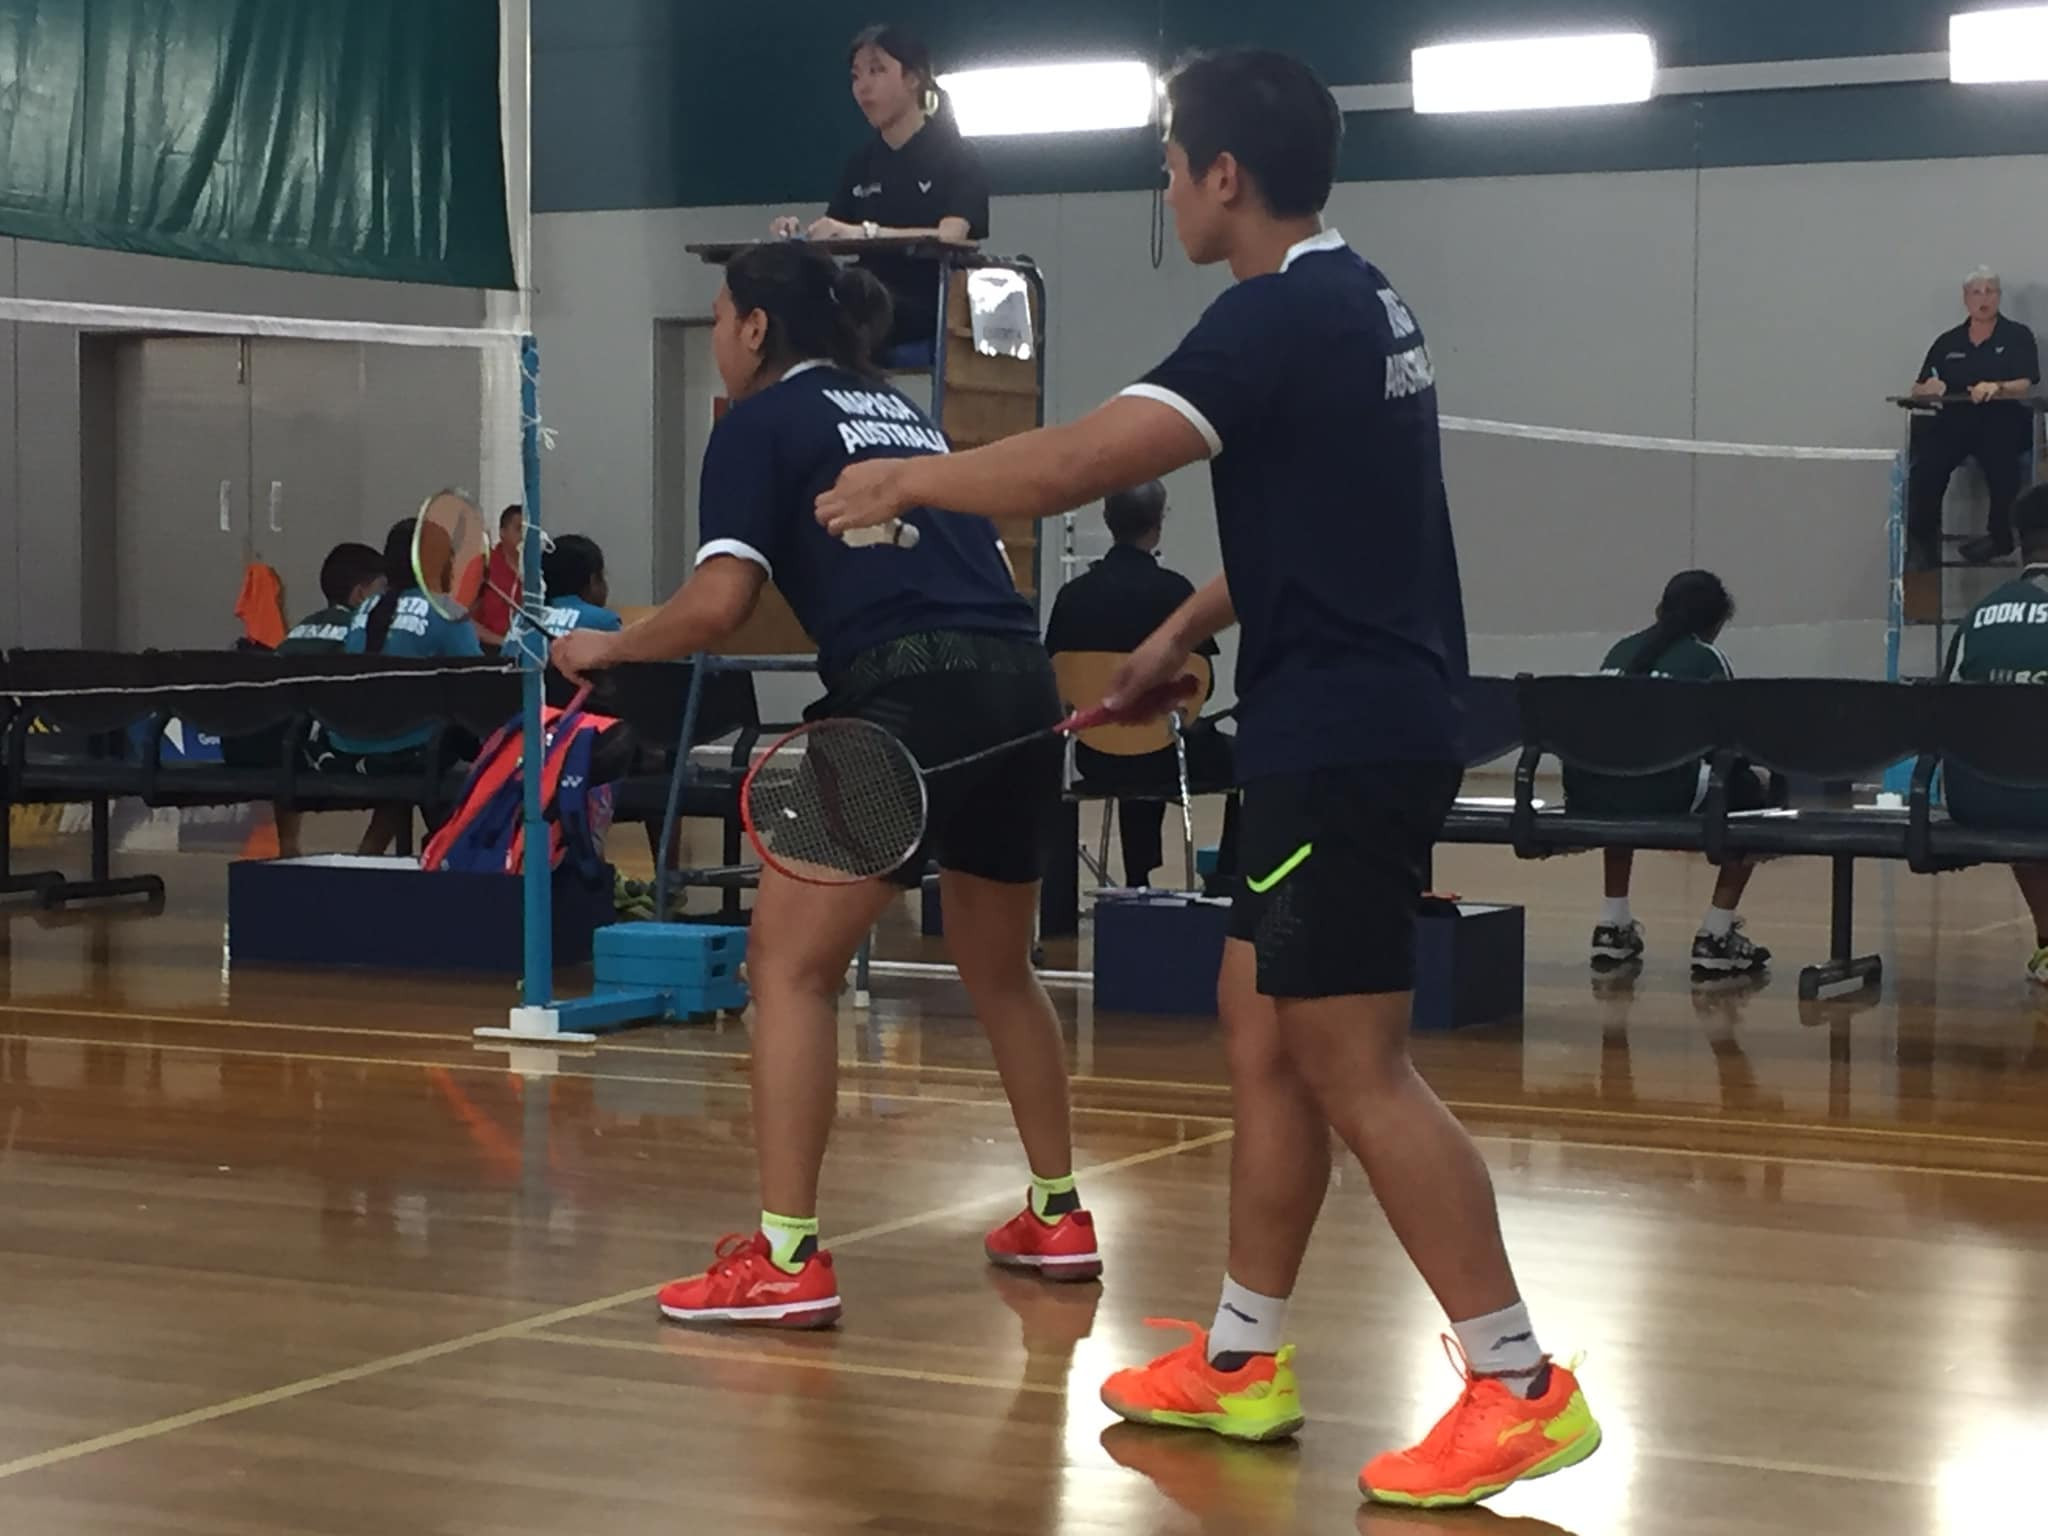 Australia won all three of their fixtures at the Oceania Mixed Team Badminton Championships in Melbourne ©Badminton Australia